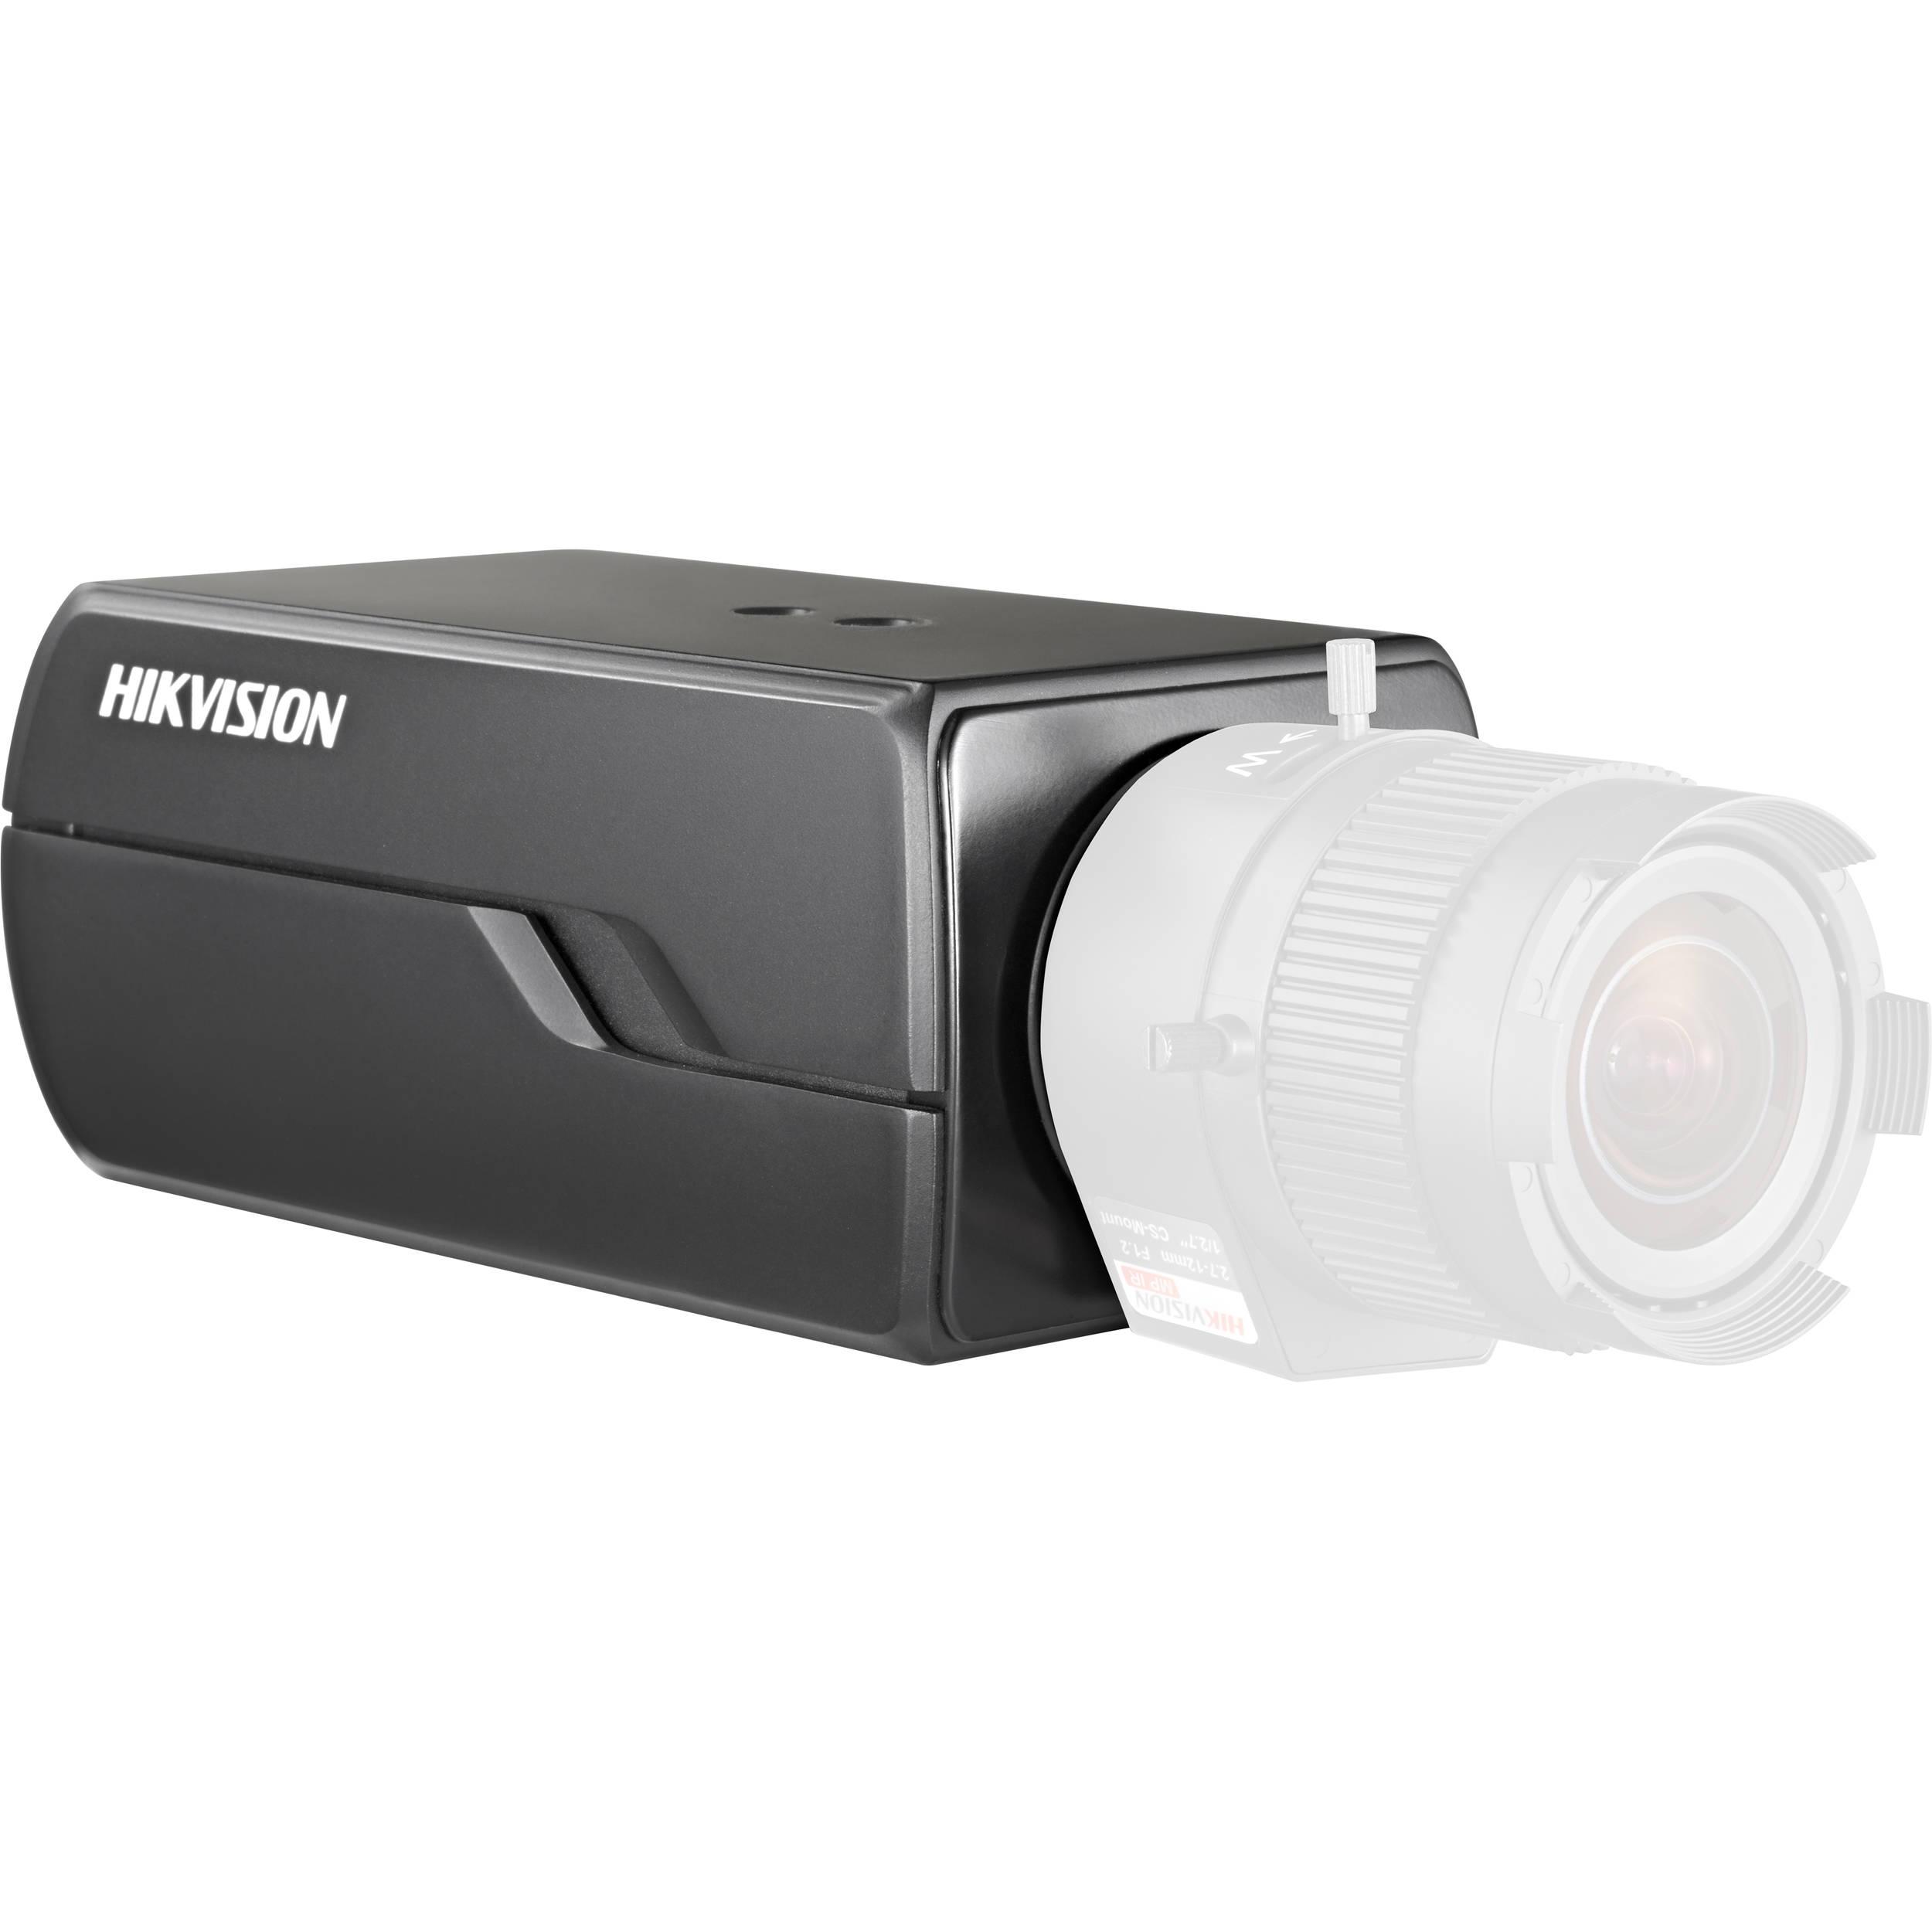 Hikvision DS-2CD6026FHWD Network Camera Windows 8 X64 Treiber